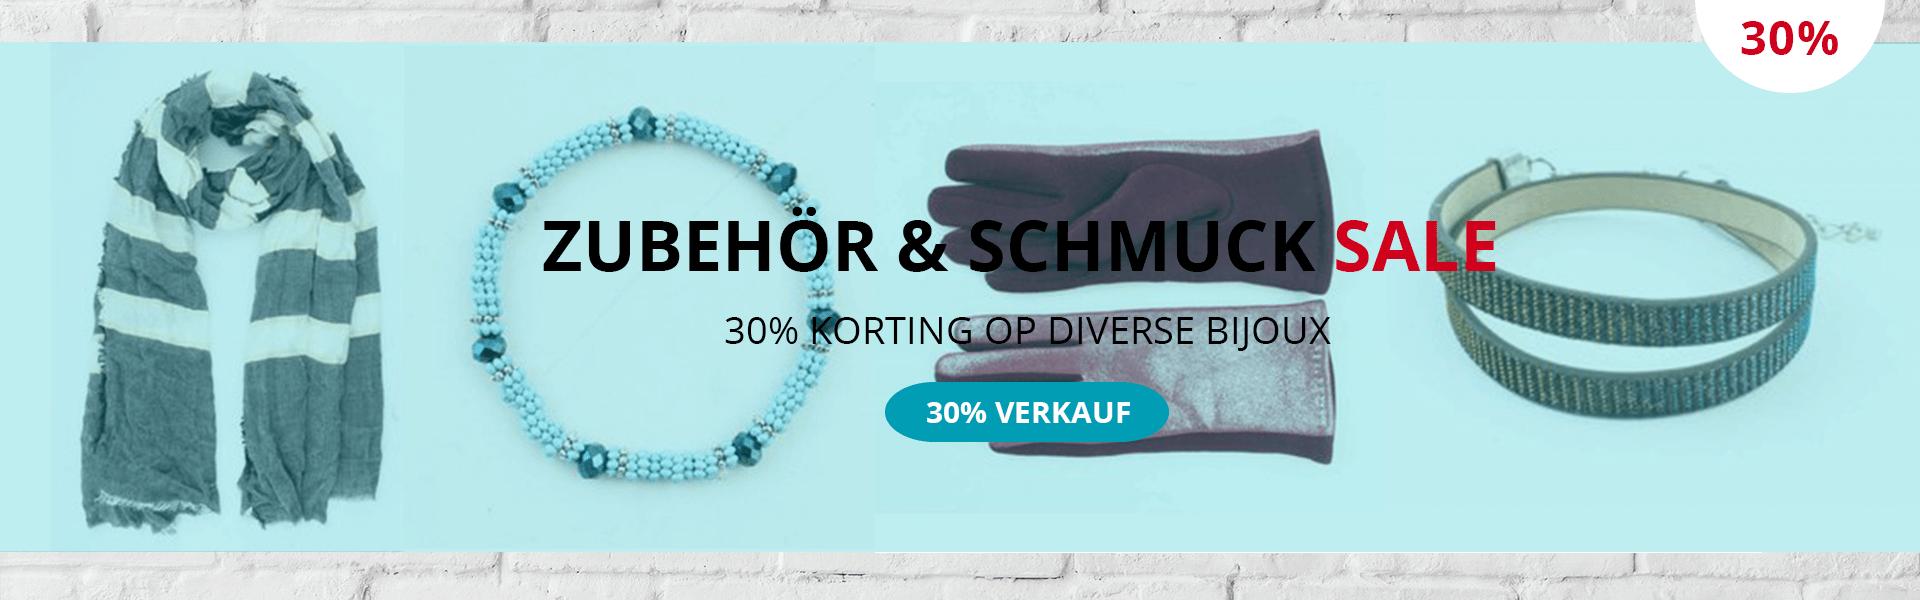 Mode Accessoires & Schmuck Großhandel - Taschen - Schals - Handschuhe & Bijoux banner 1